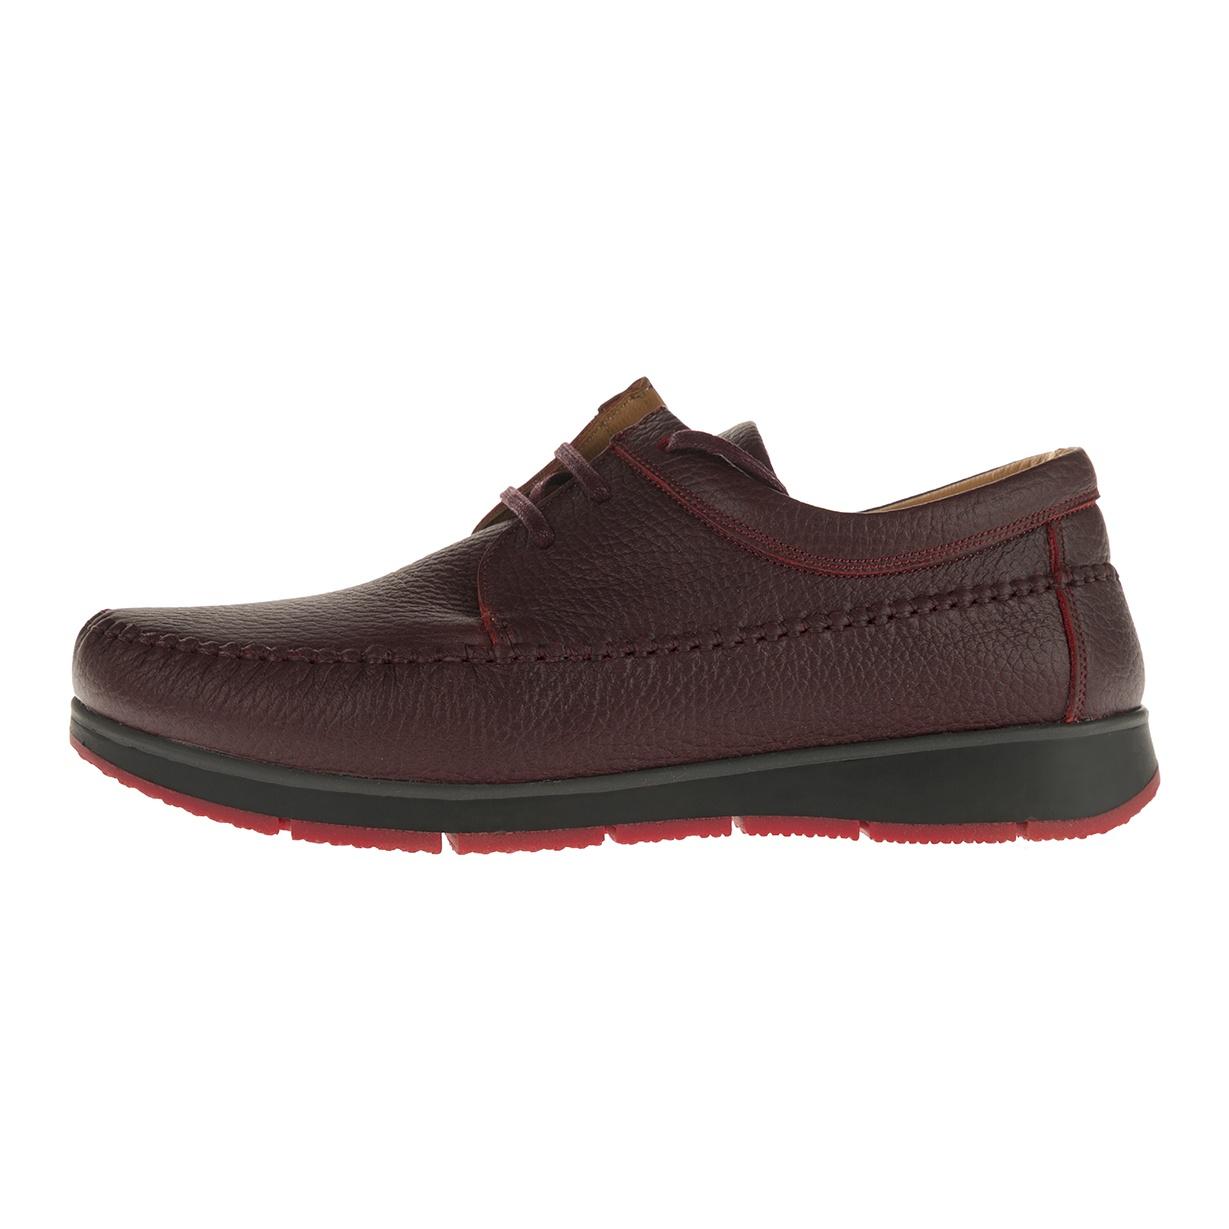 کفش راحتی نه برتونیکس مدل 733-13